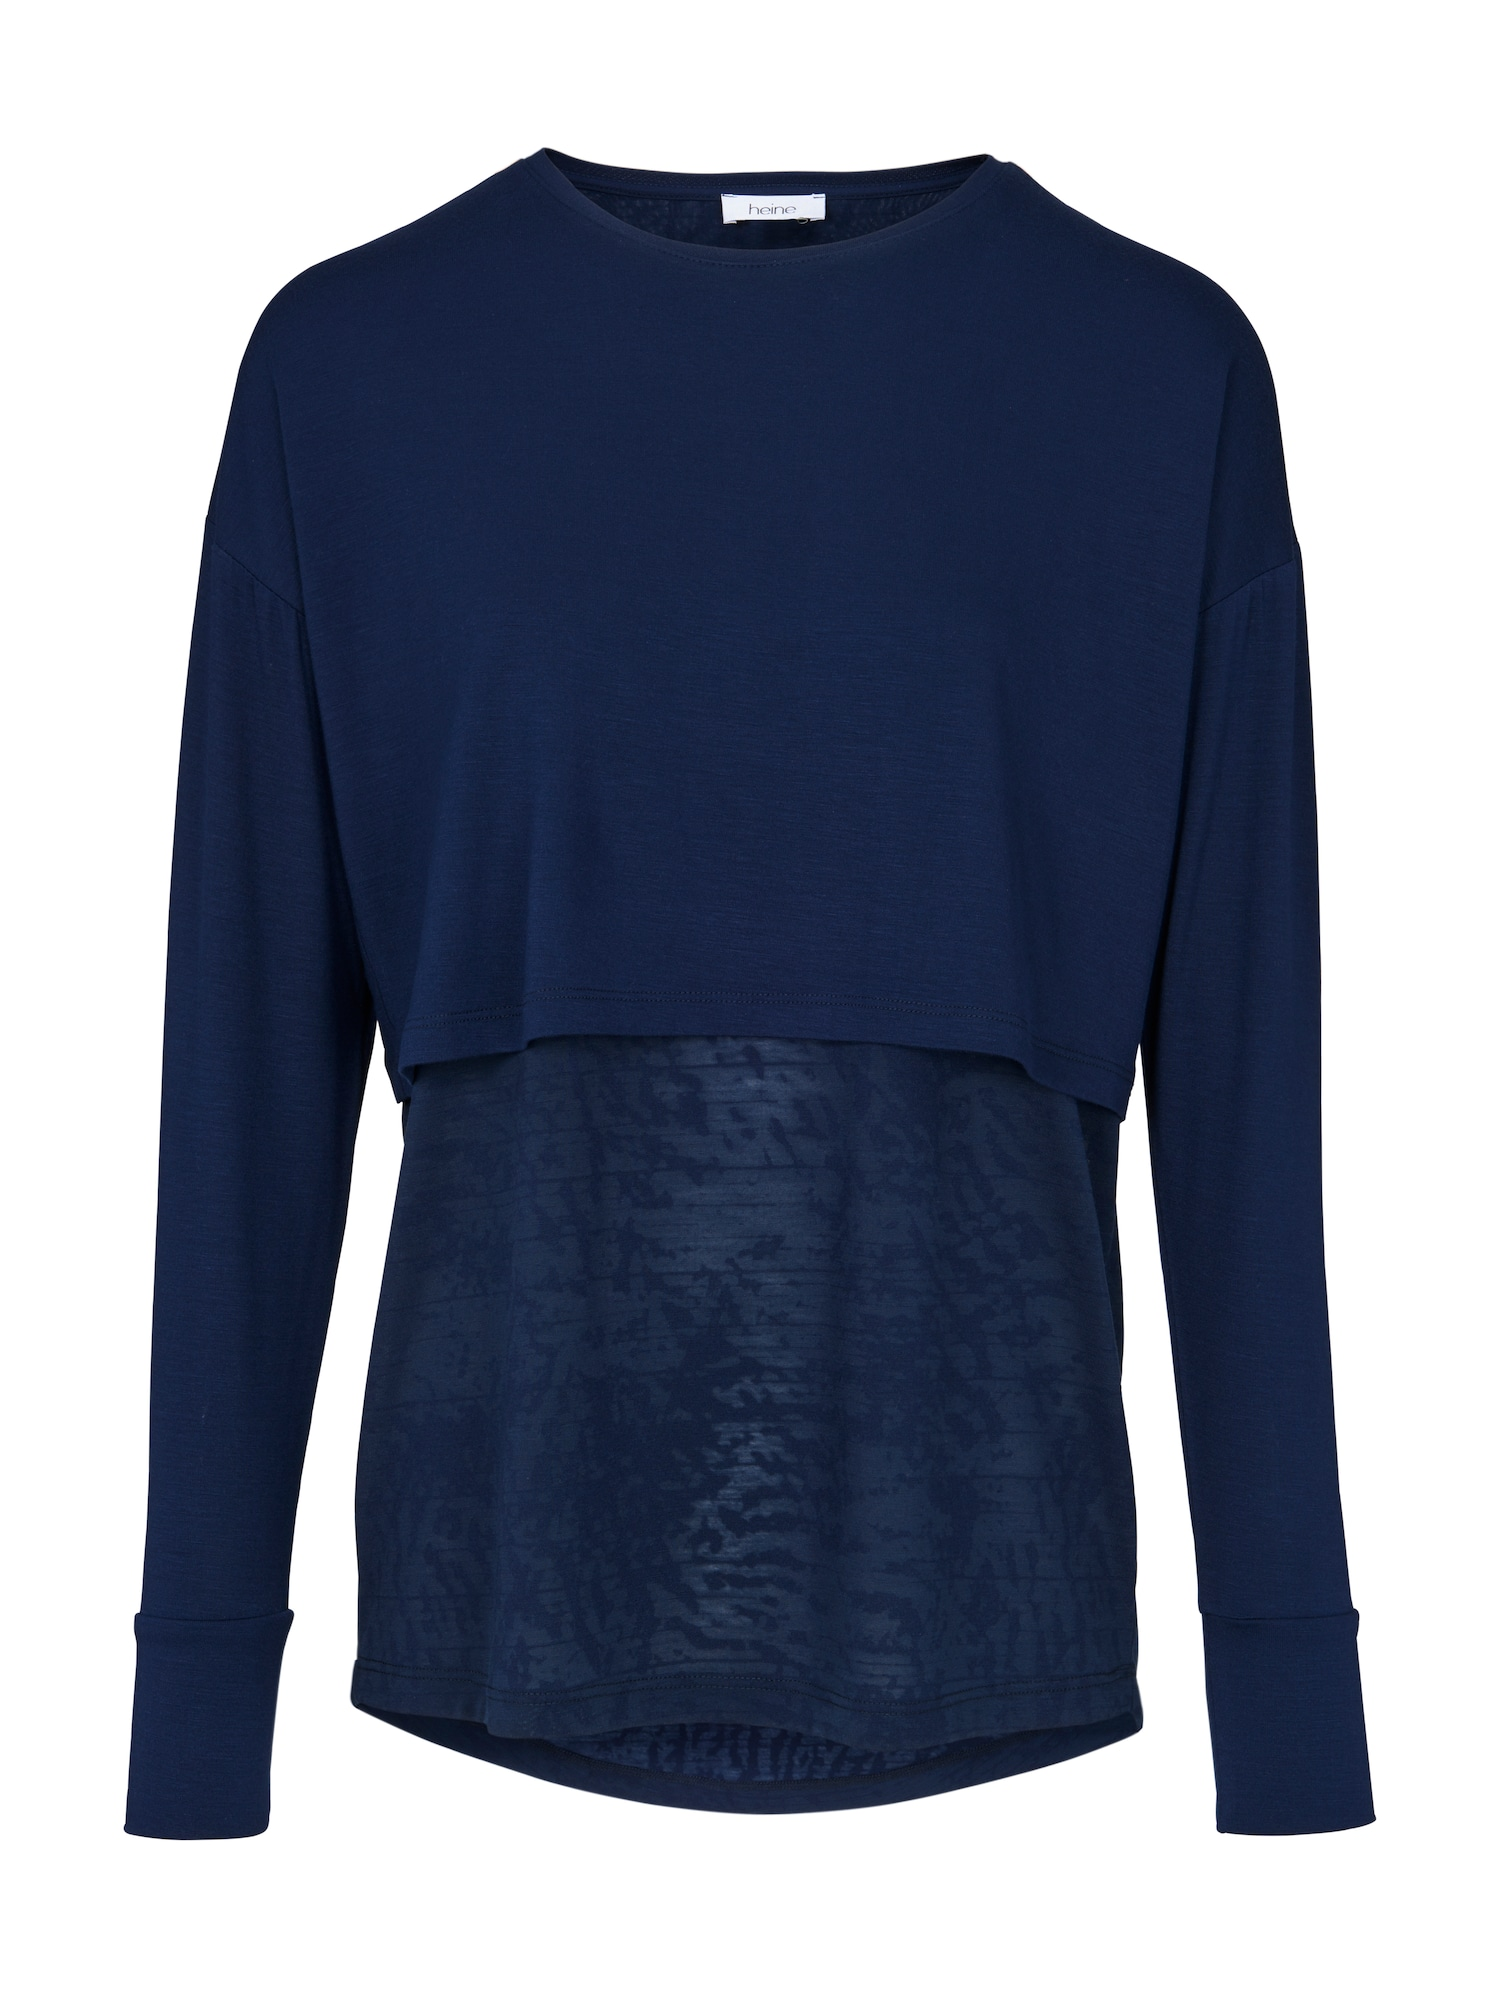 Tričko tmavě modrá Heine